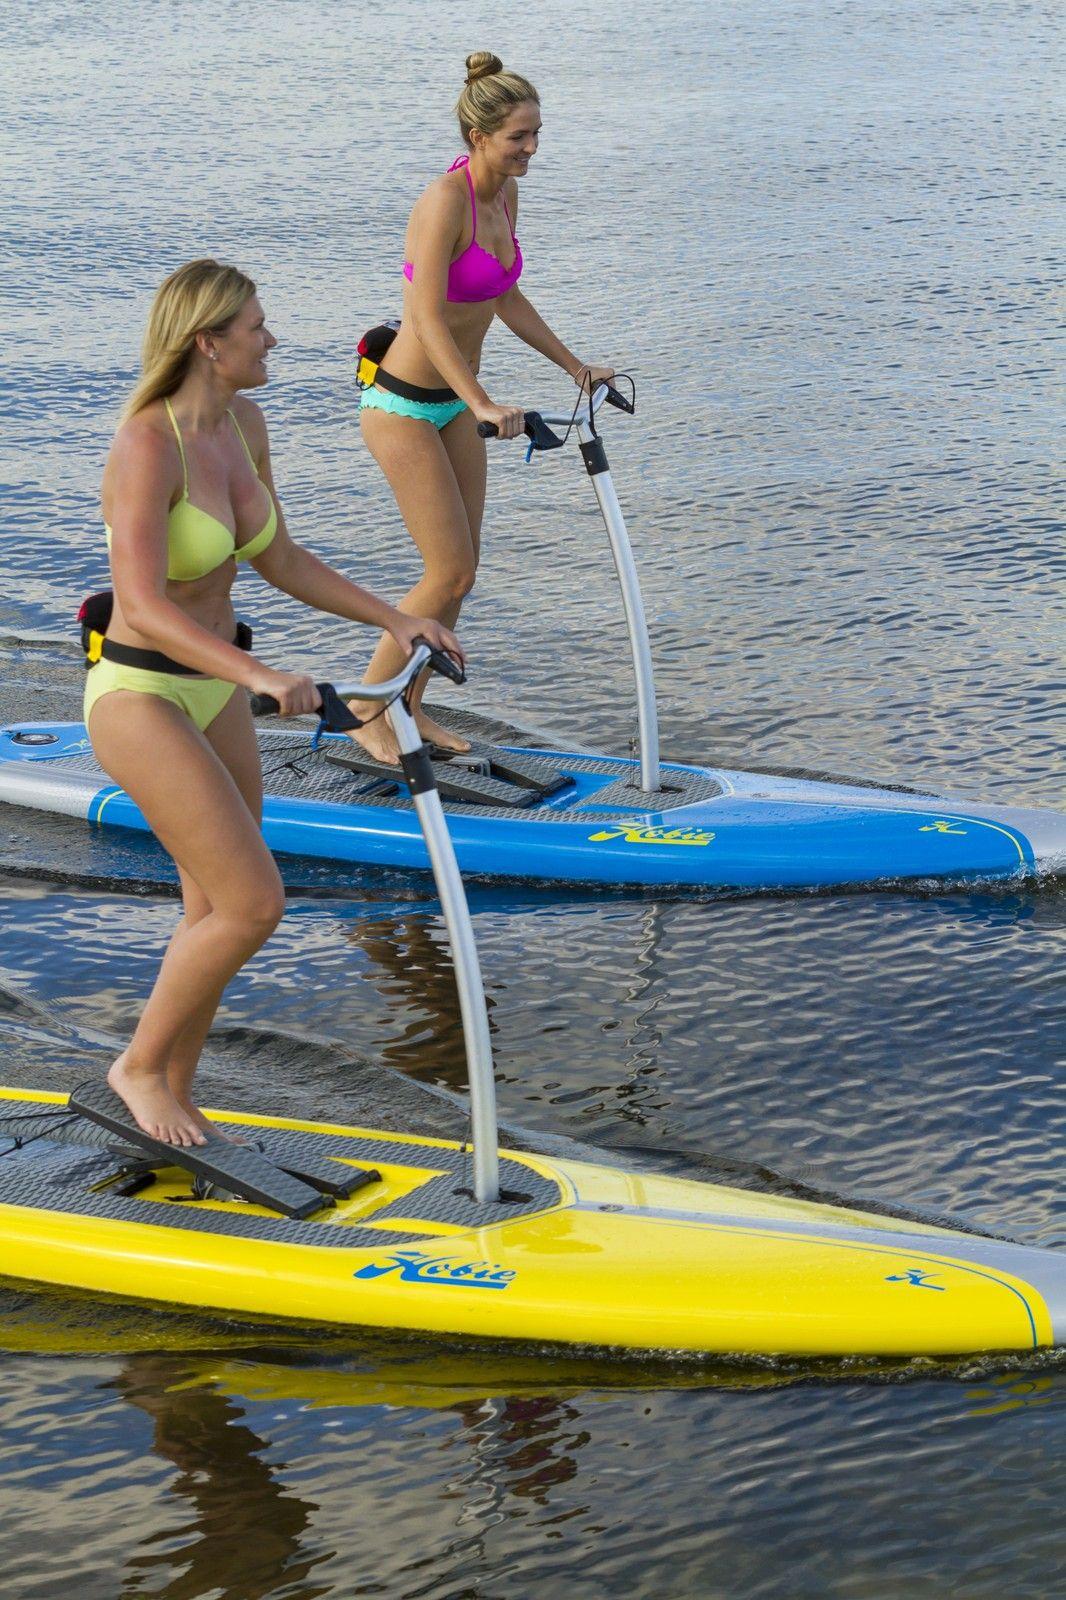 Hobie Elliptical Sup Eclipse Ocean Fishing Hobie Mirage Kayak Fishing